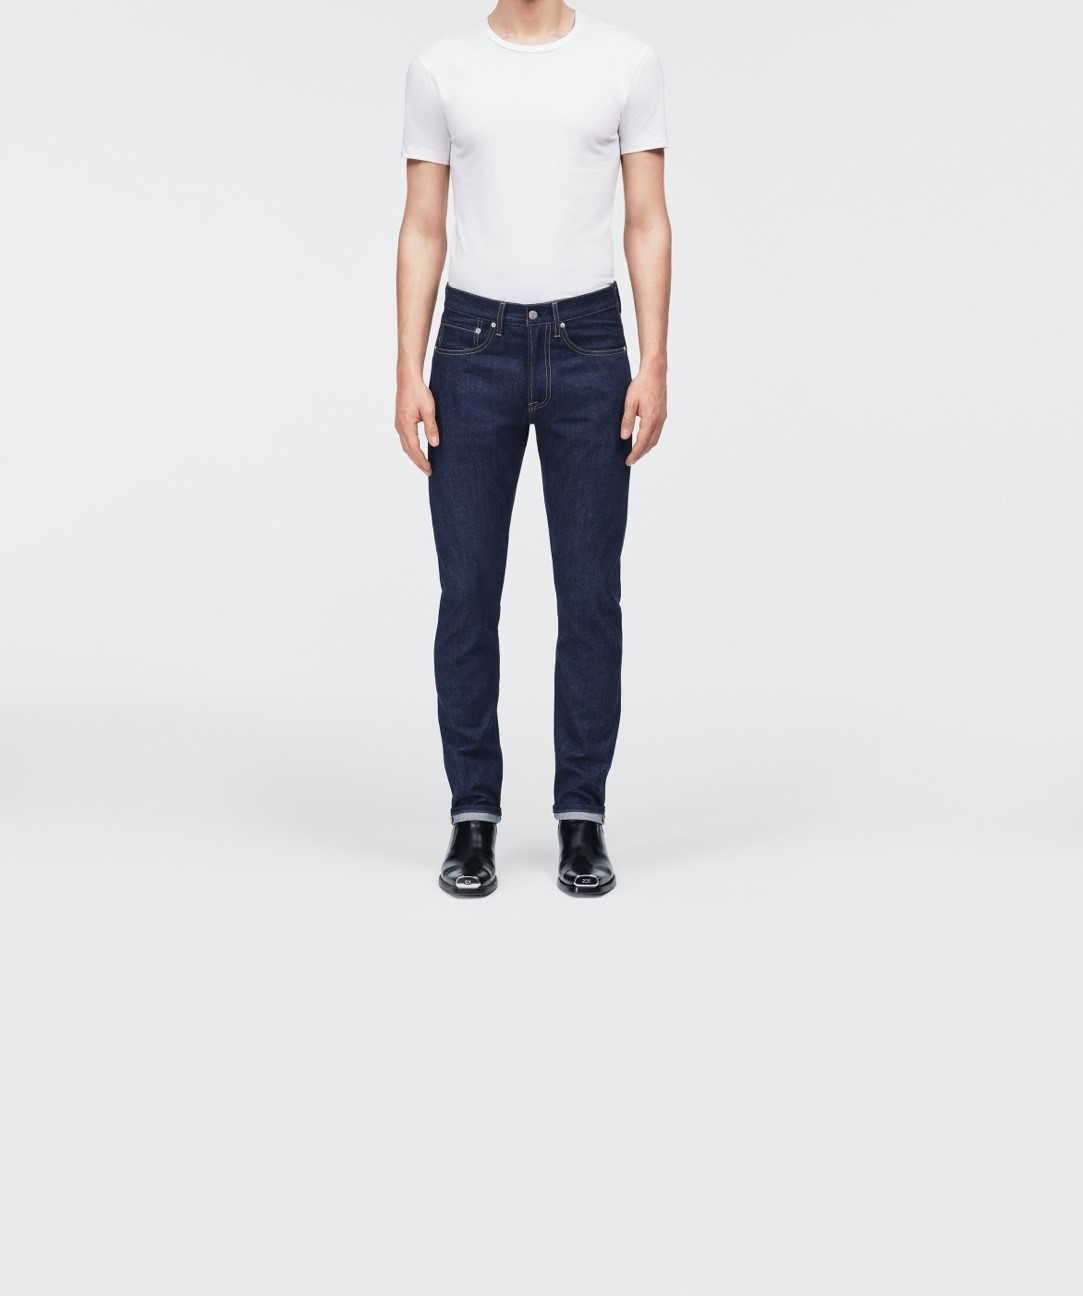 calvin klein jeans - taper 1 - elle man